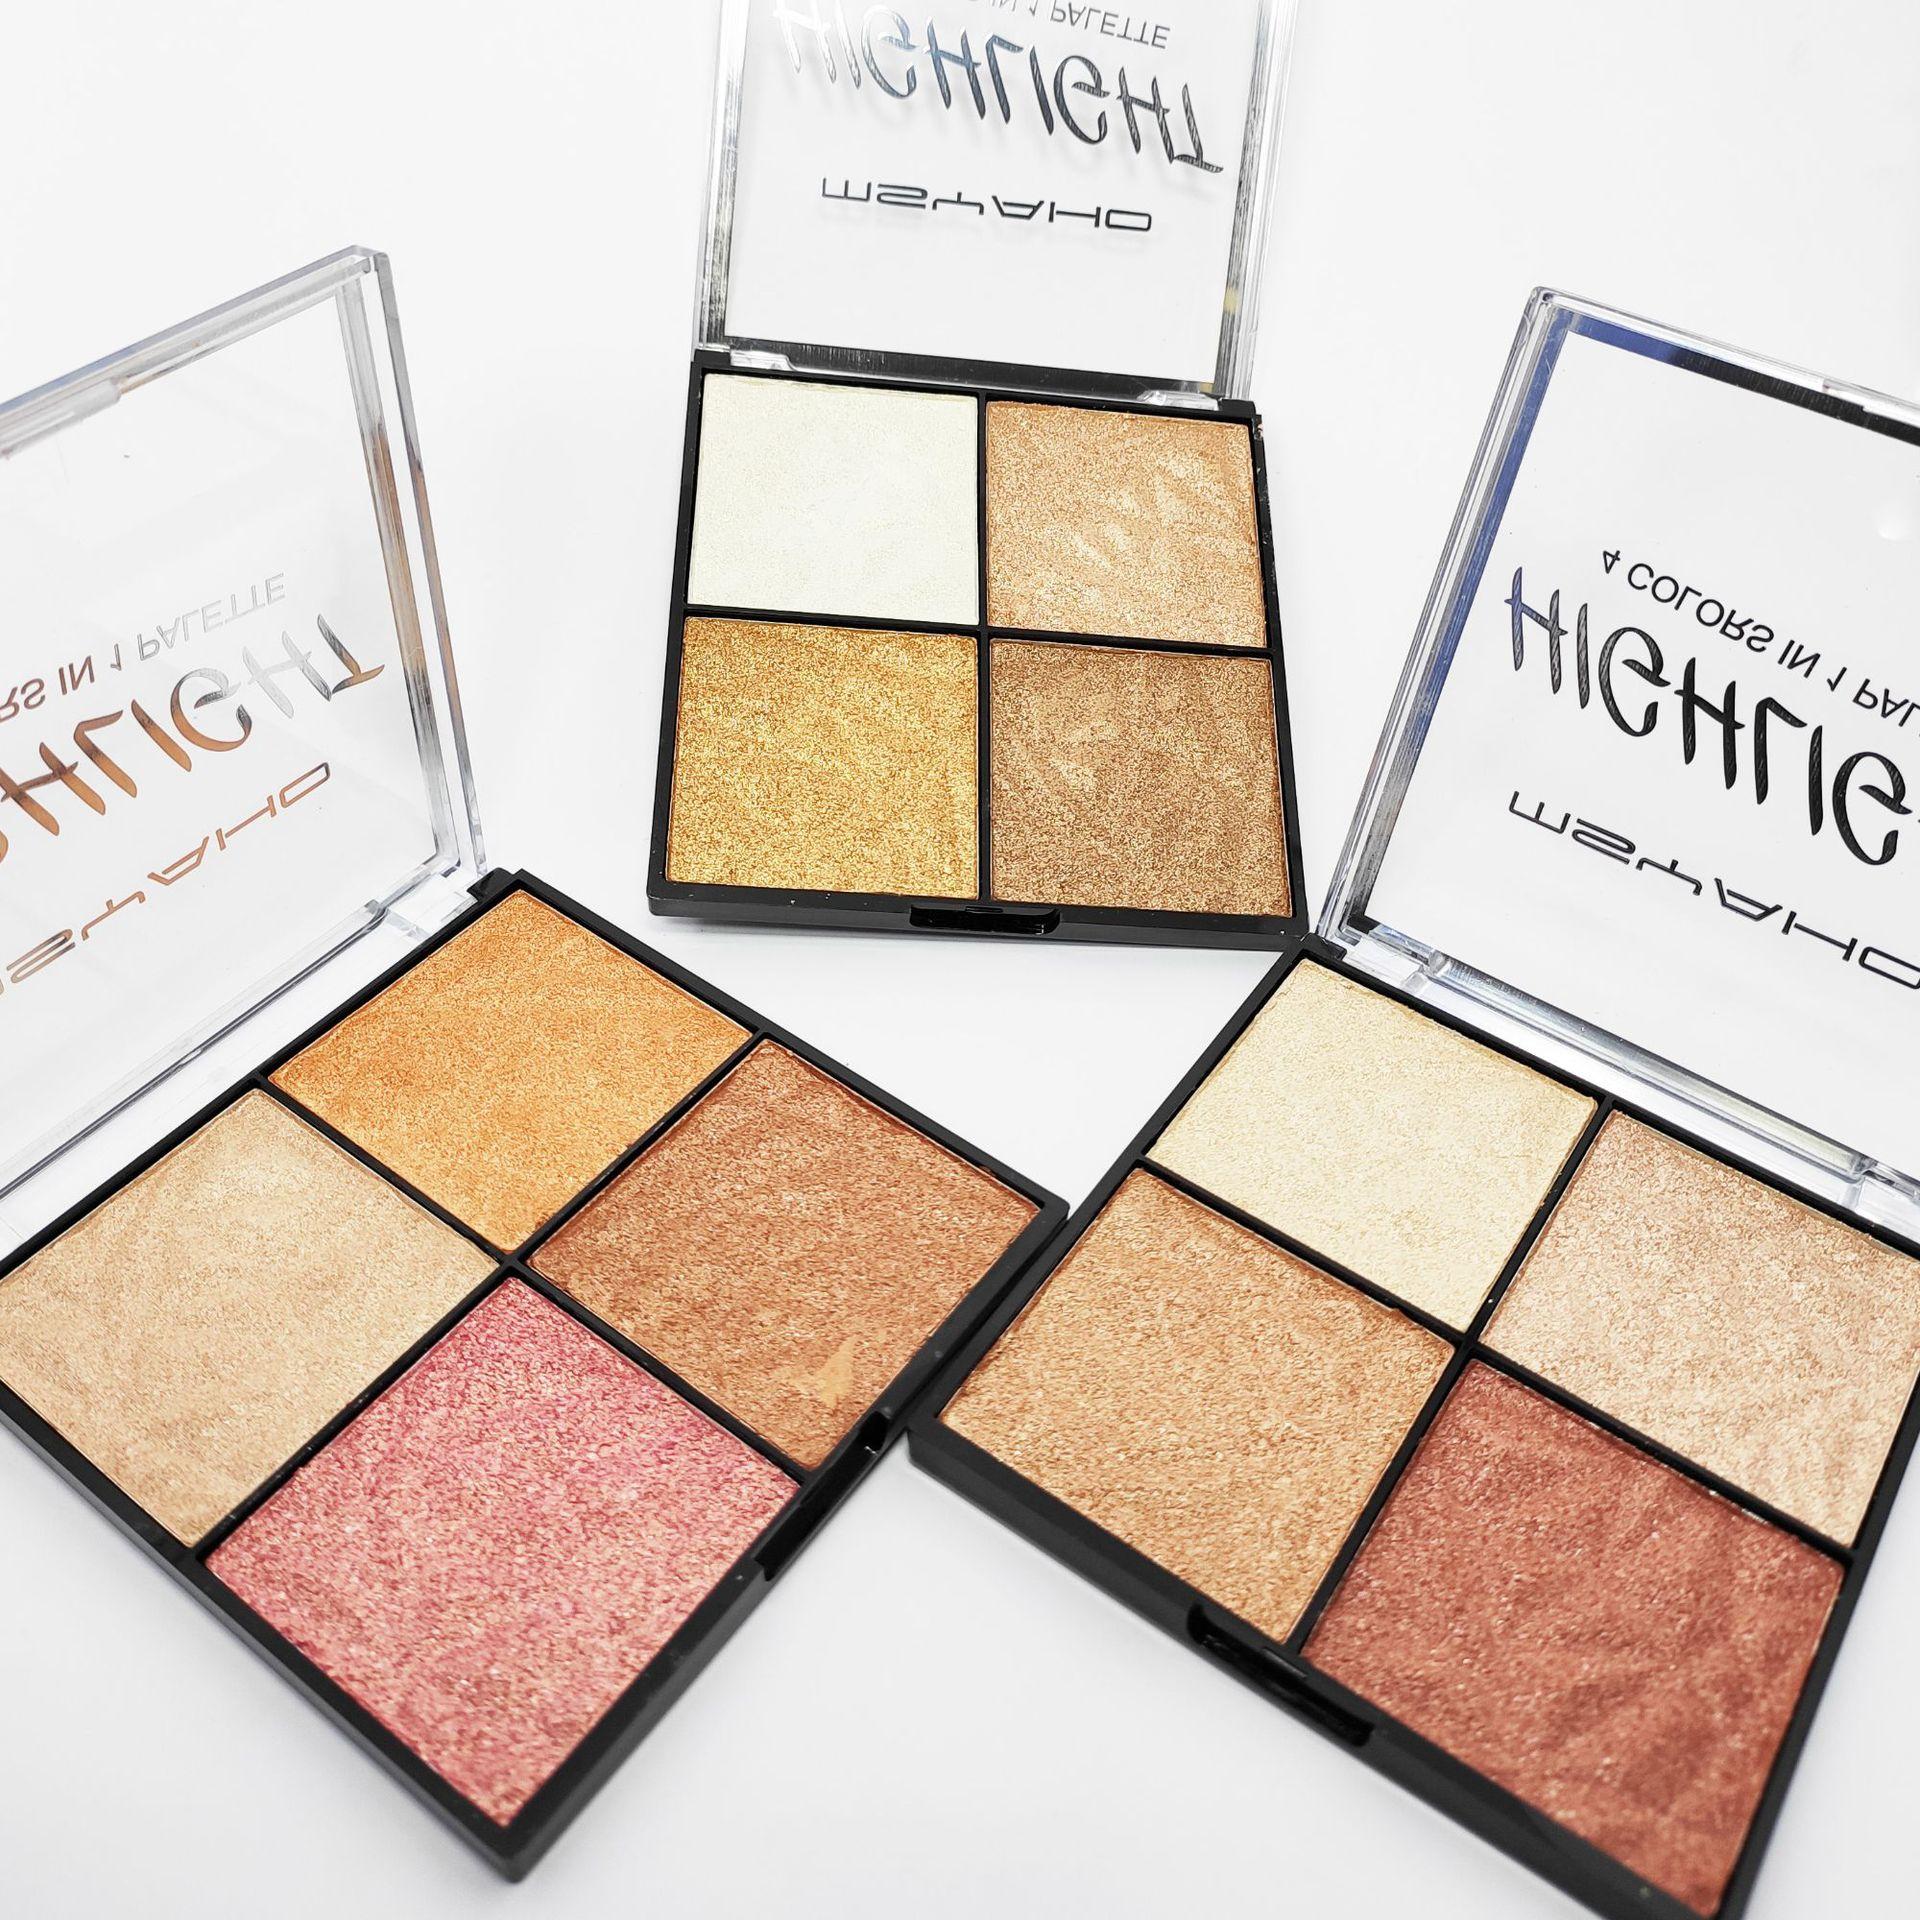 Givenone 4 Color Makeup Highlighter Palette Bronzer Powder Bright Facial Contour Blush Palette Shimmer Make Up Blusher Highlight